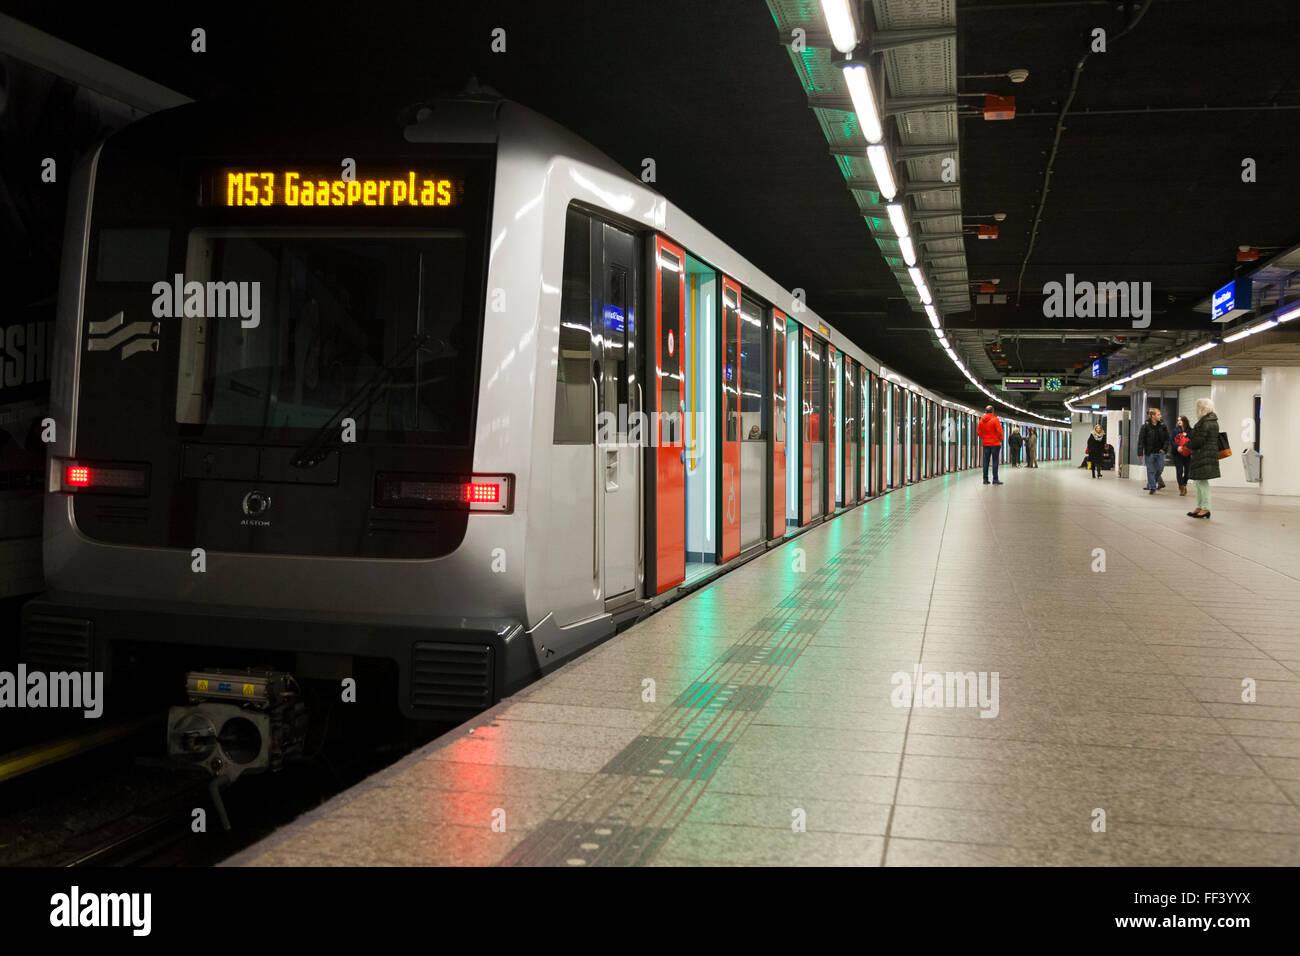 Metro tube train: doors open (green light) before doors closing ...